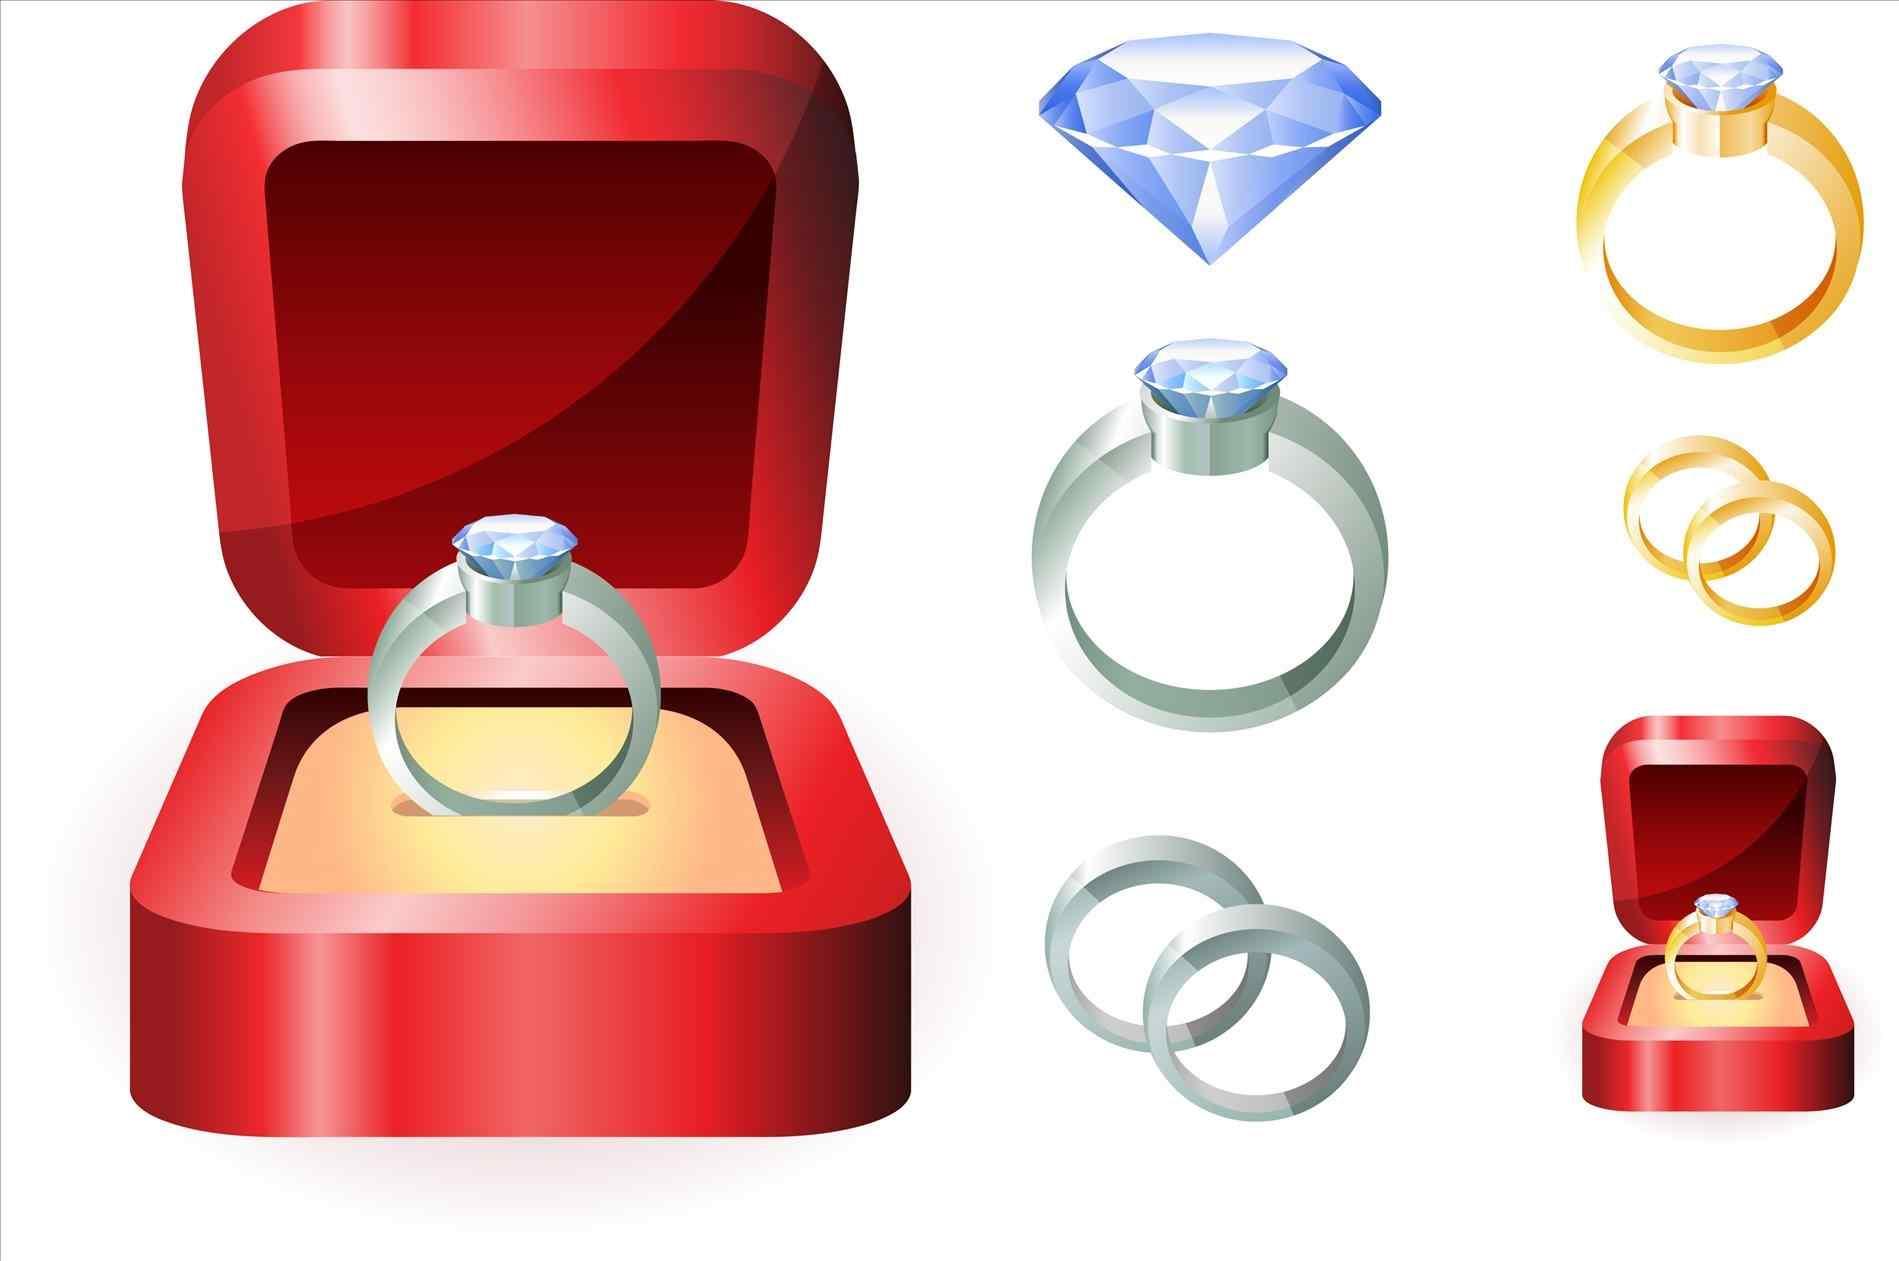 1899x1261 Diamond Ring Clipart No Background monih.info